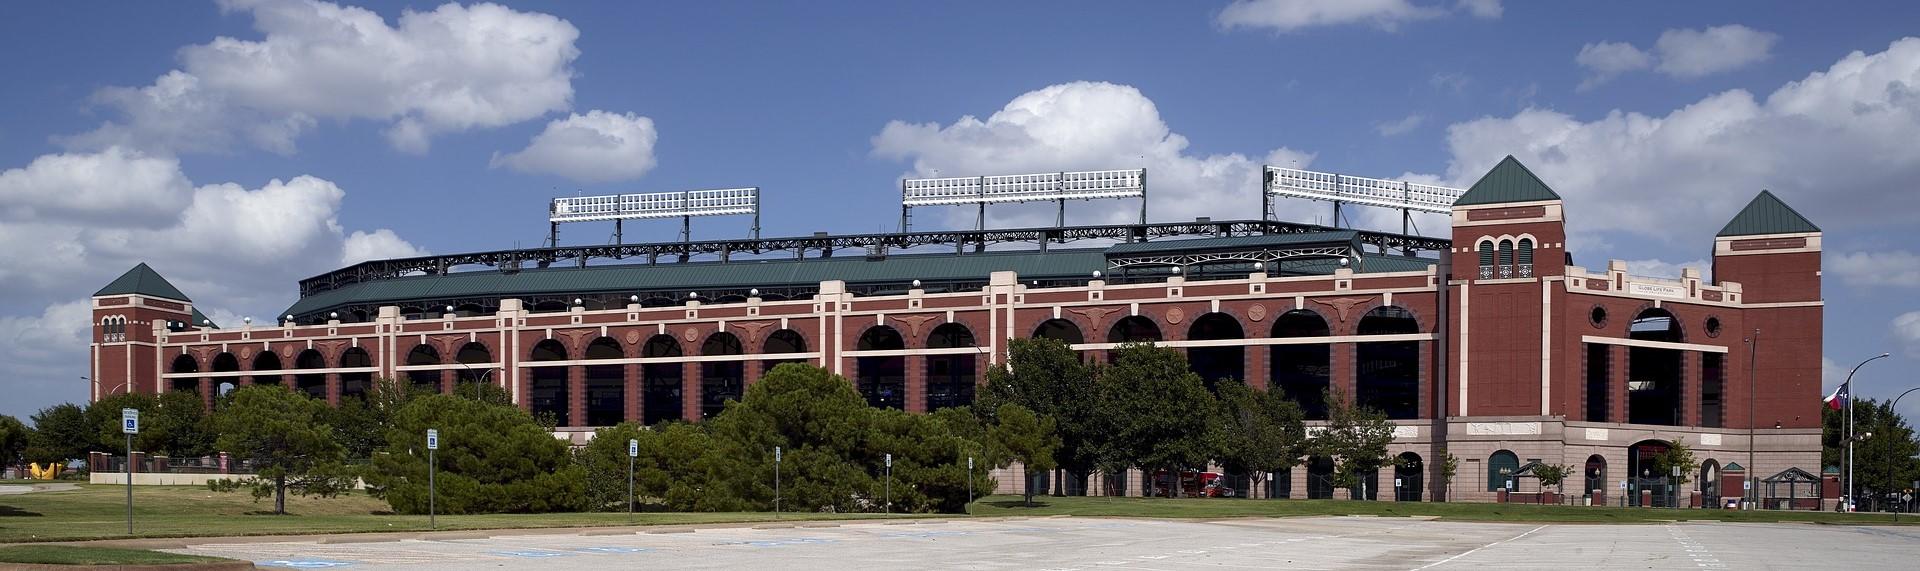 Baseball Stadium in Arlington, Texas   Breast Cancer Car Donations